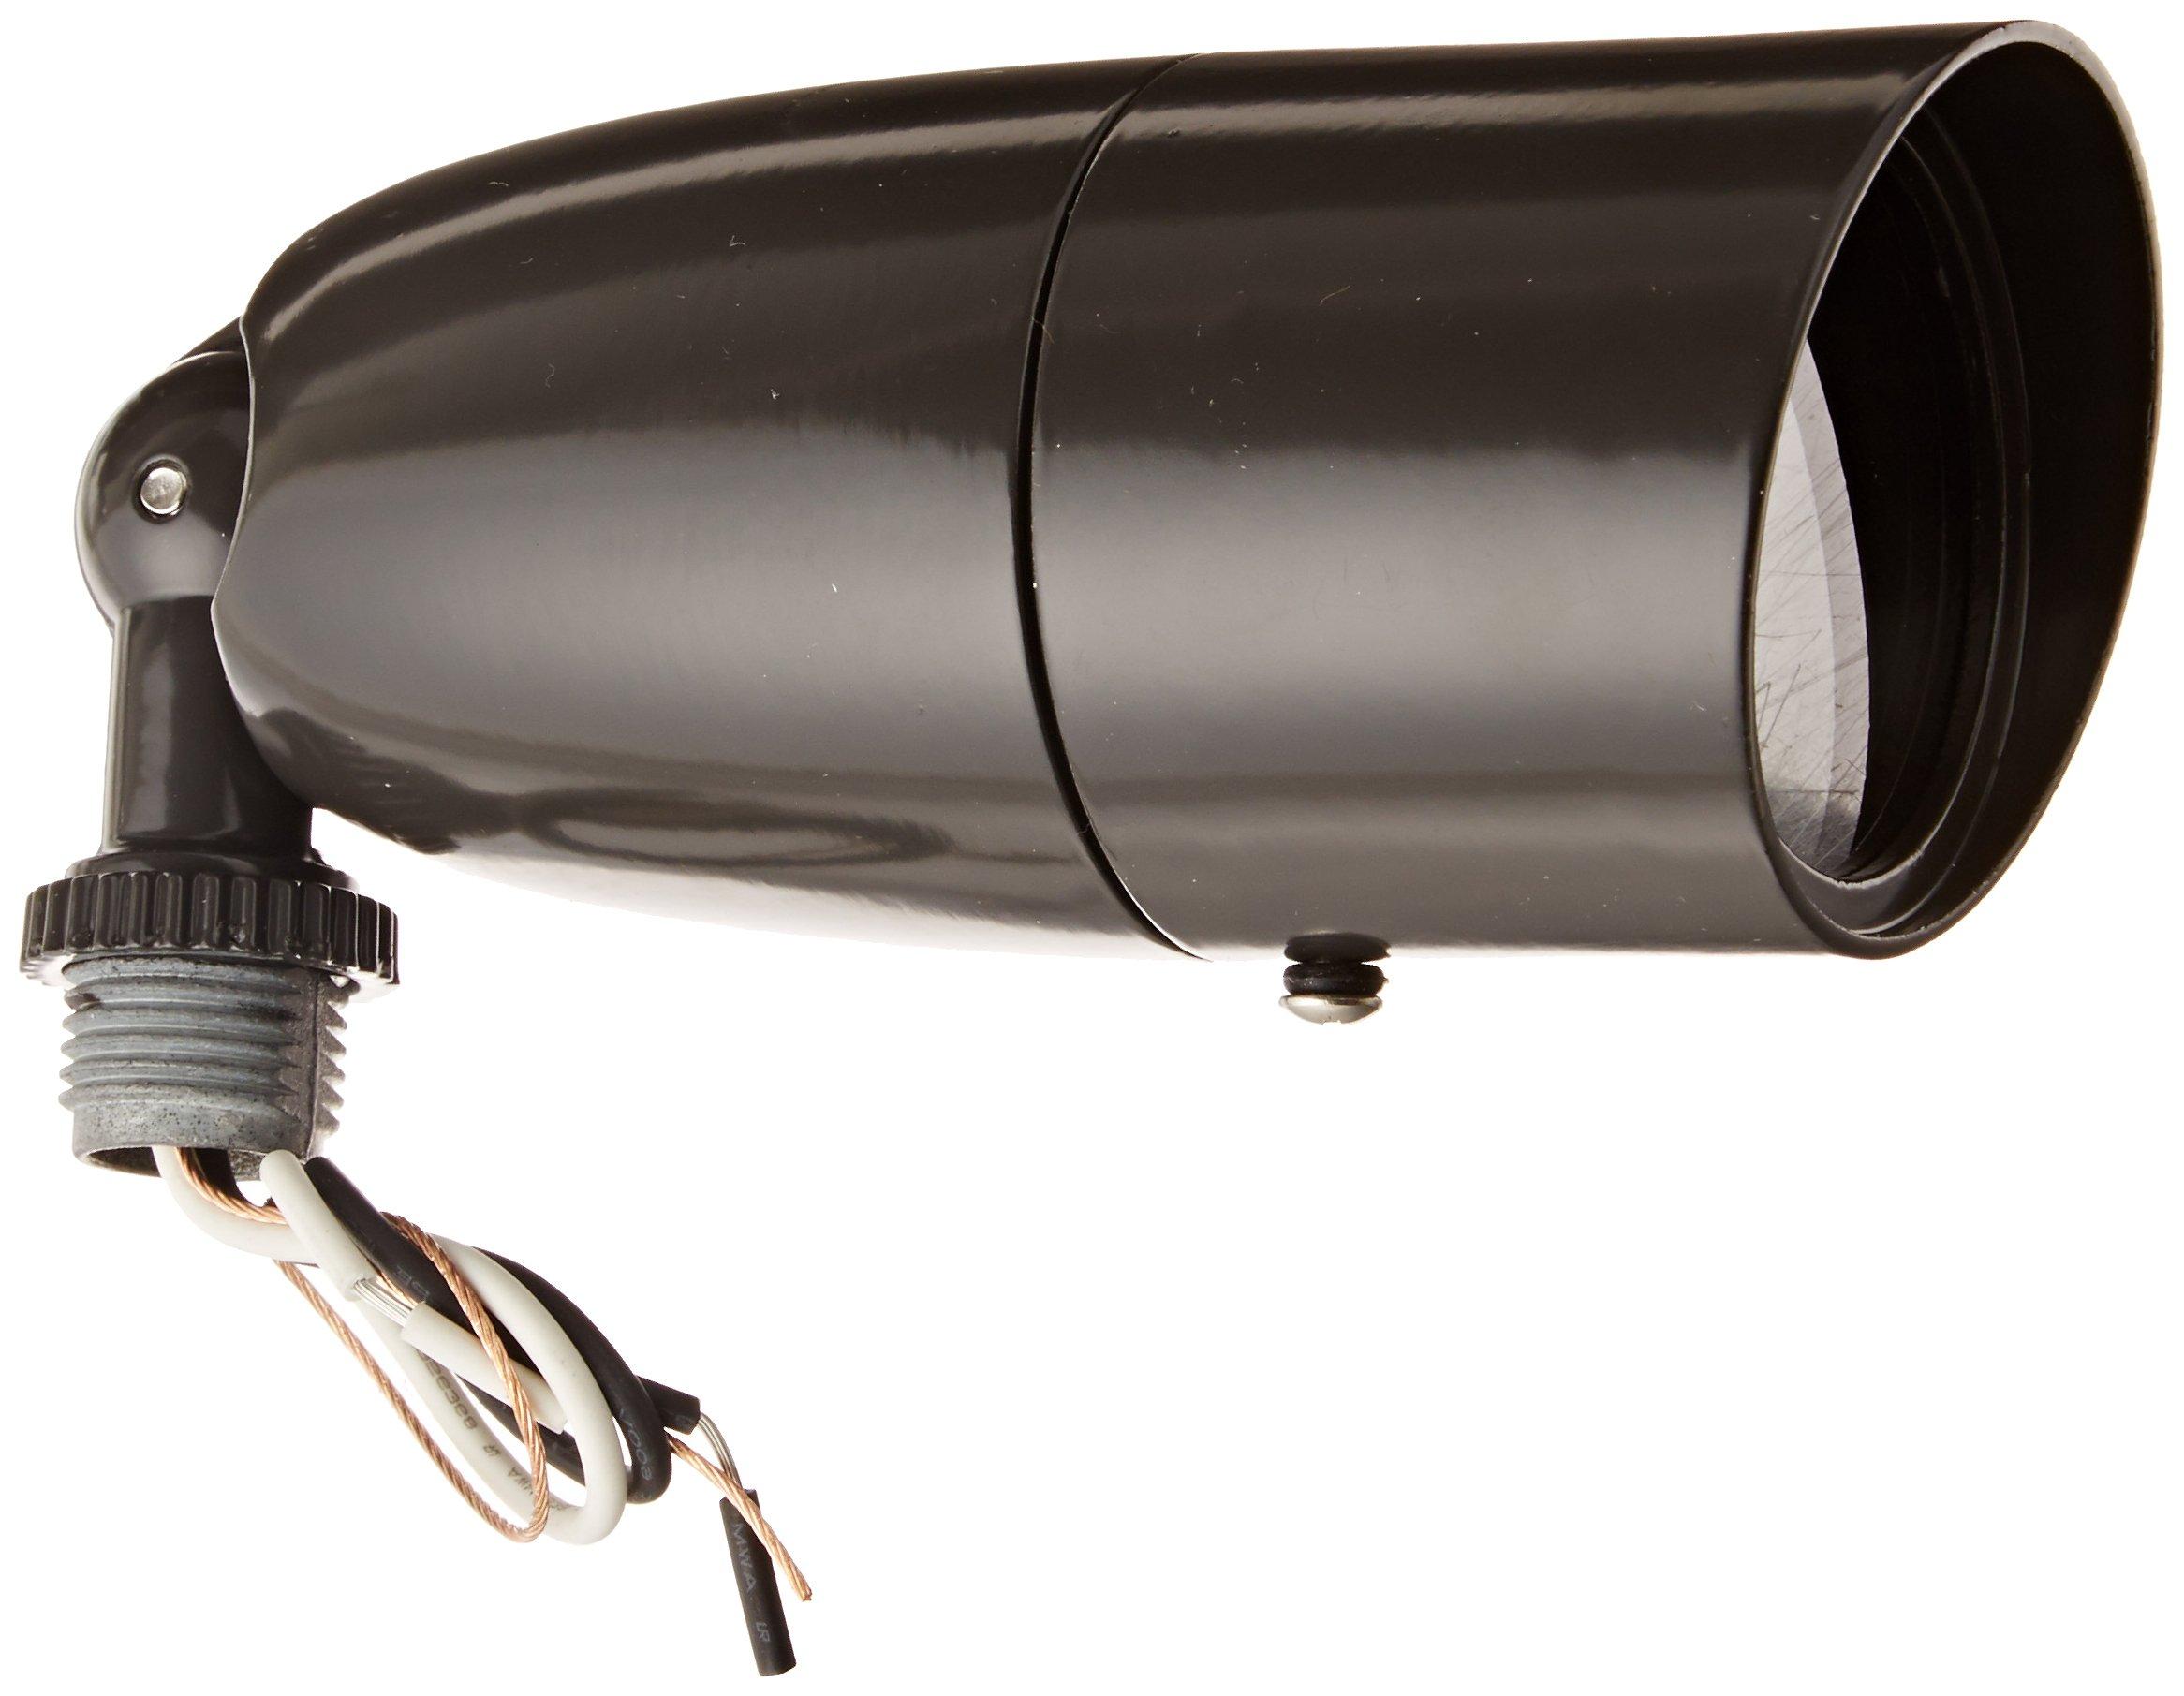 RAB Lighting LFP16A Sleek Floodlight, PAR16 Type, Aluminum, 60W Power, 650 Lumens, 120V, Bronze Color